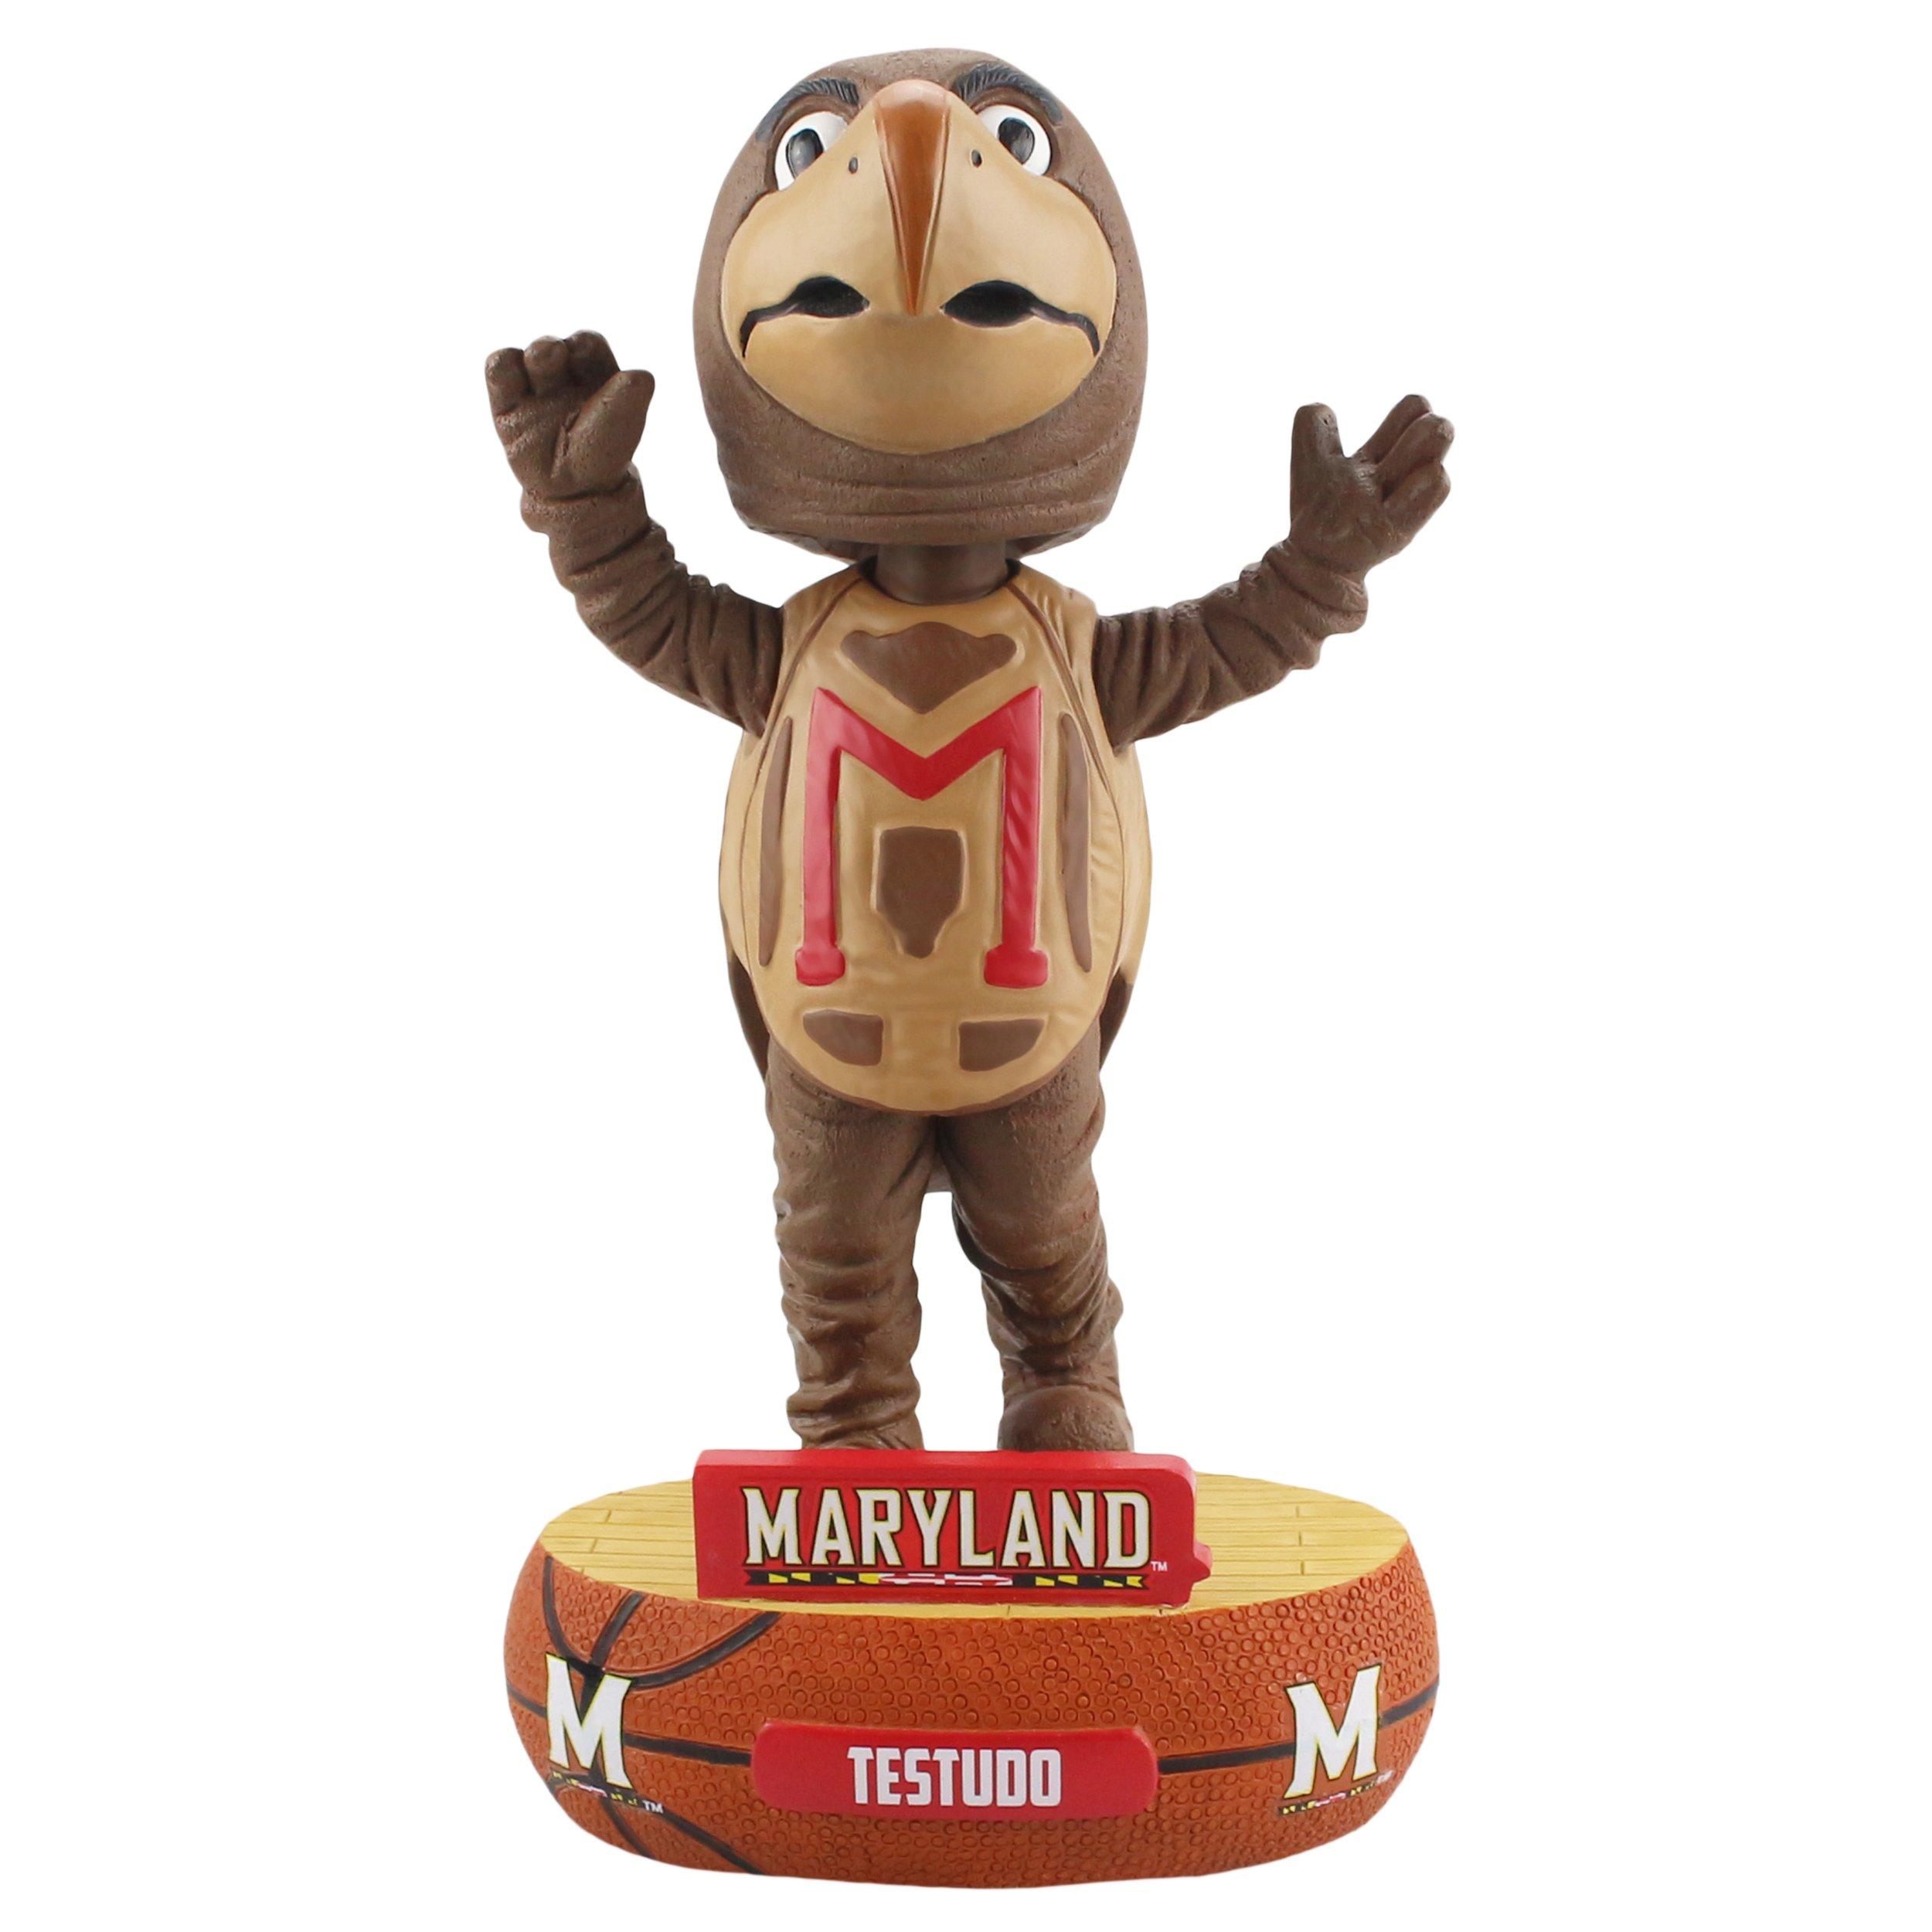 Maryland Terrapins Mascot Testudo Baller Special Edition Bobblehead NCAA